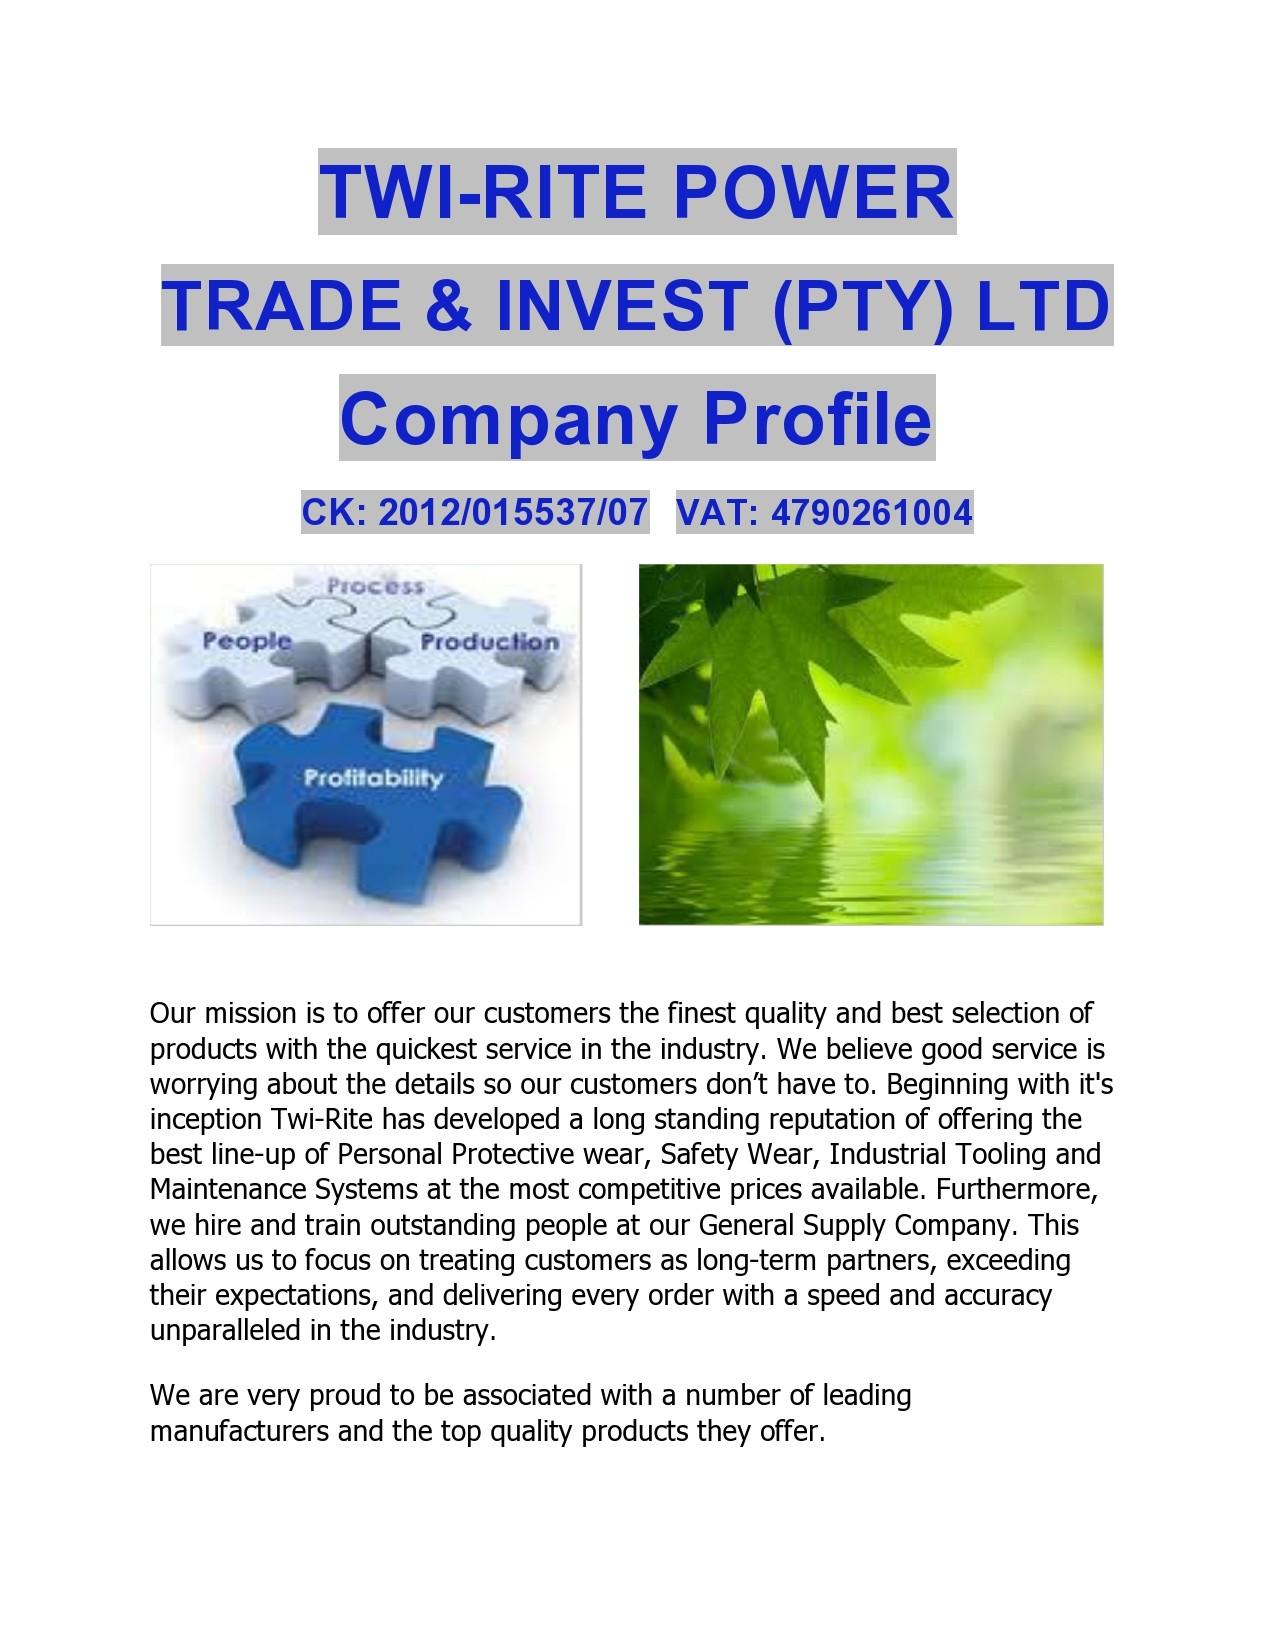 Free company profile template 45